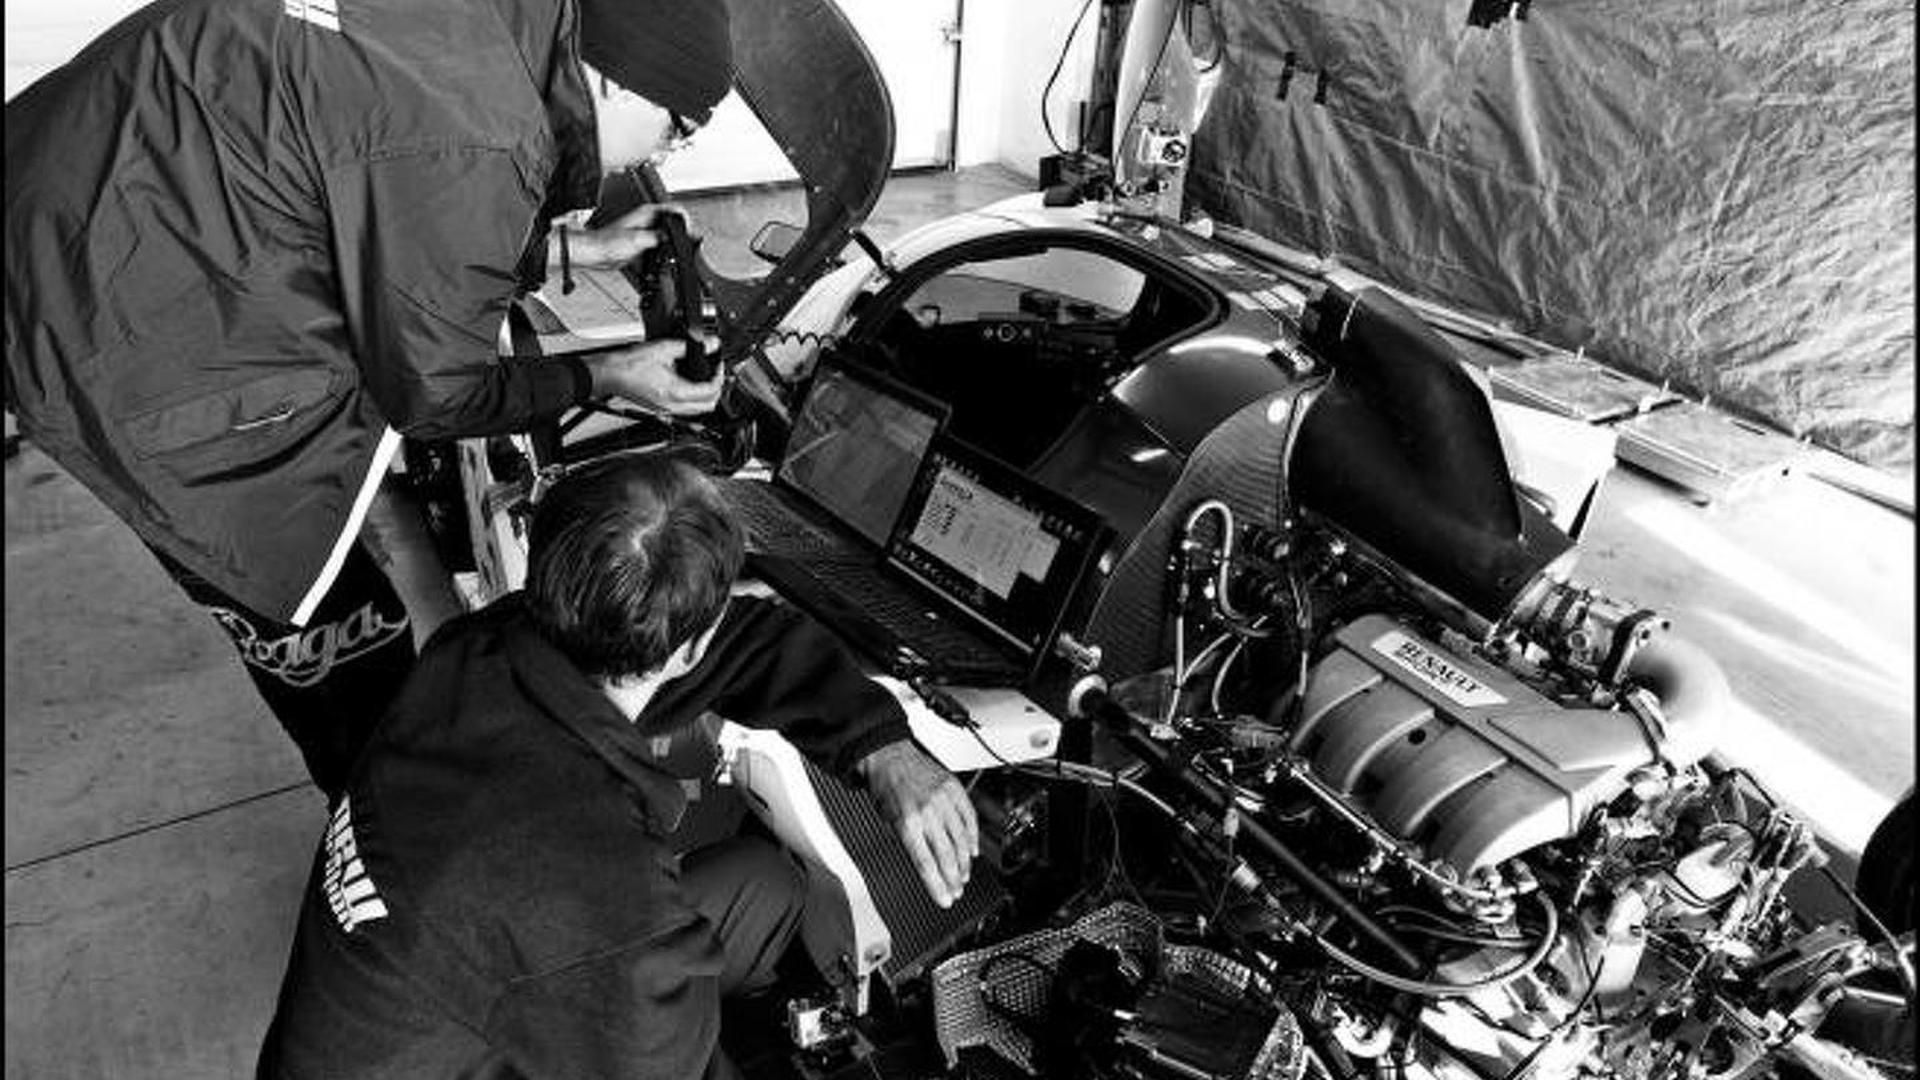 Praga R1 with Renaultsport engine revealed [video]